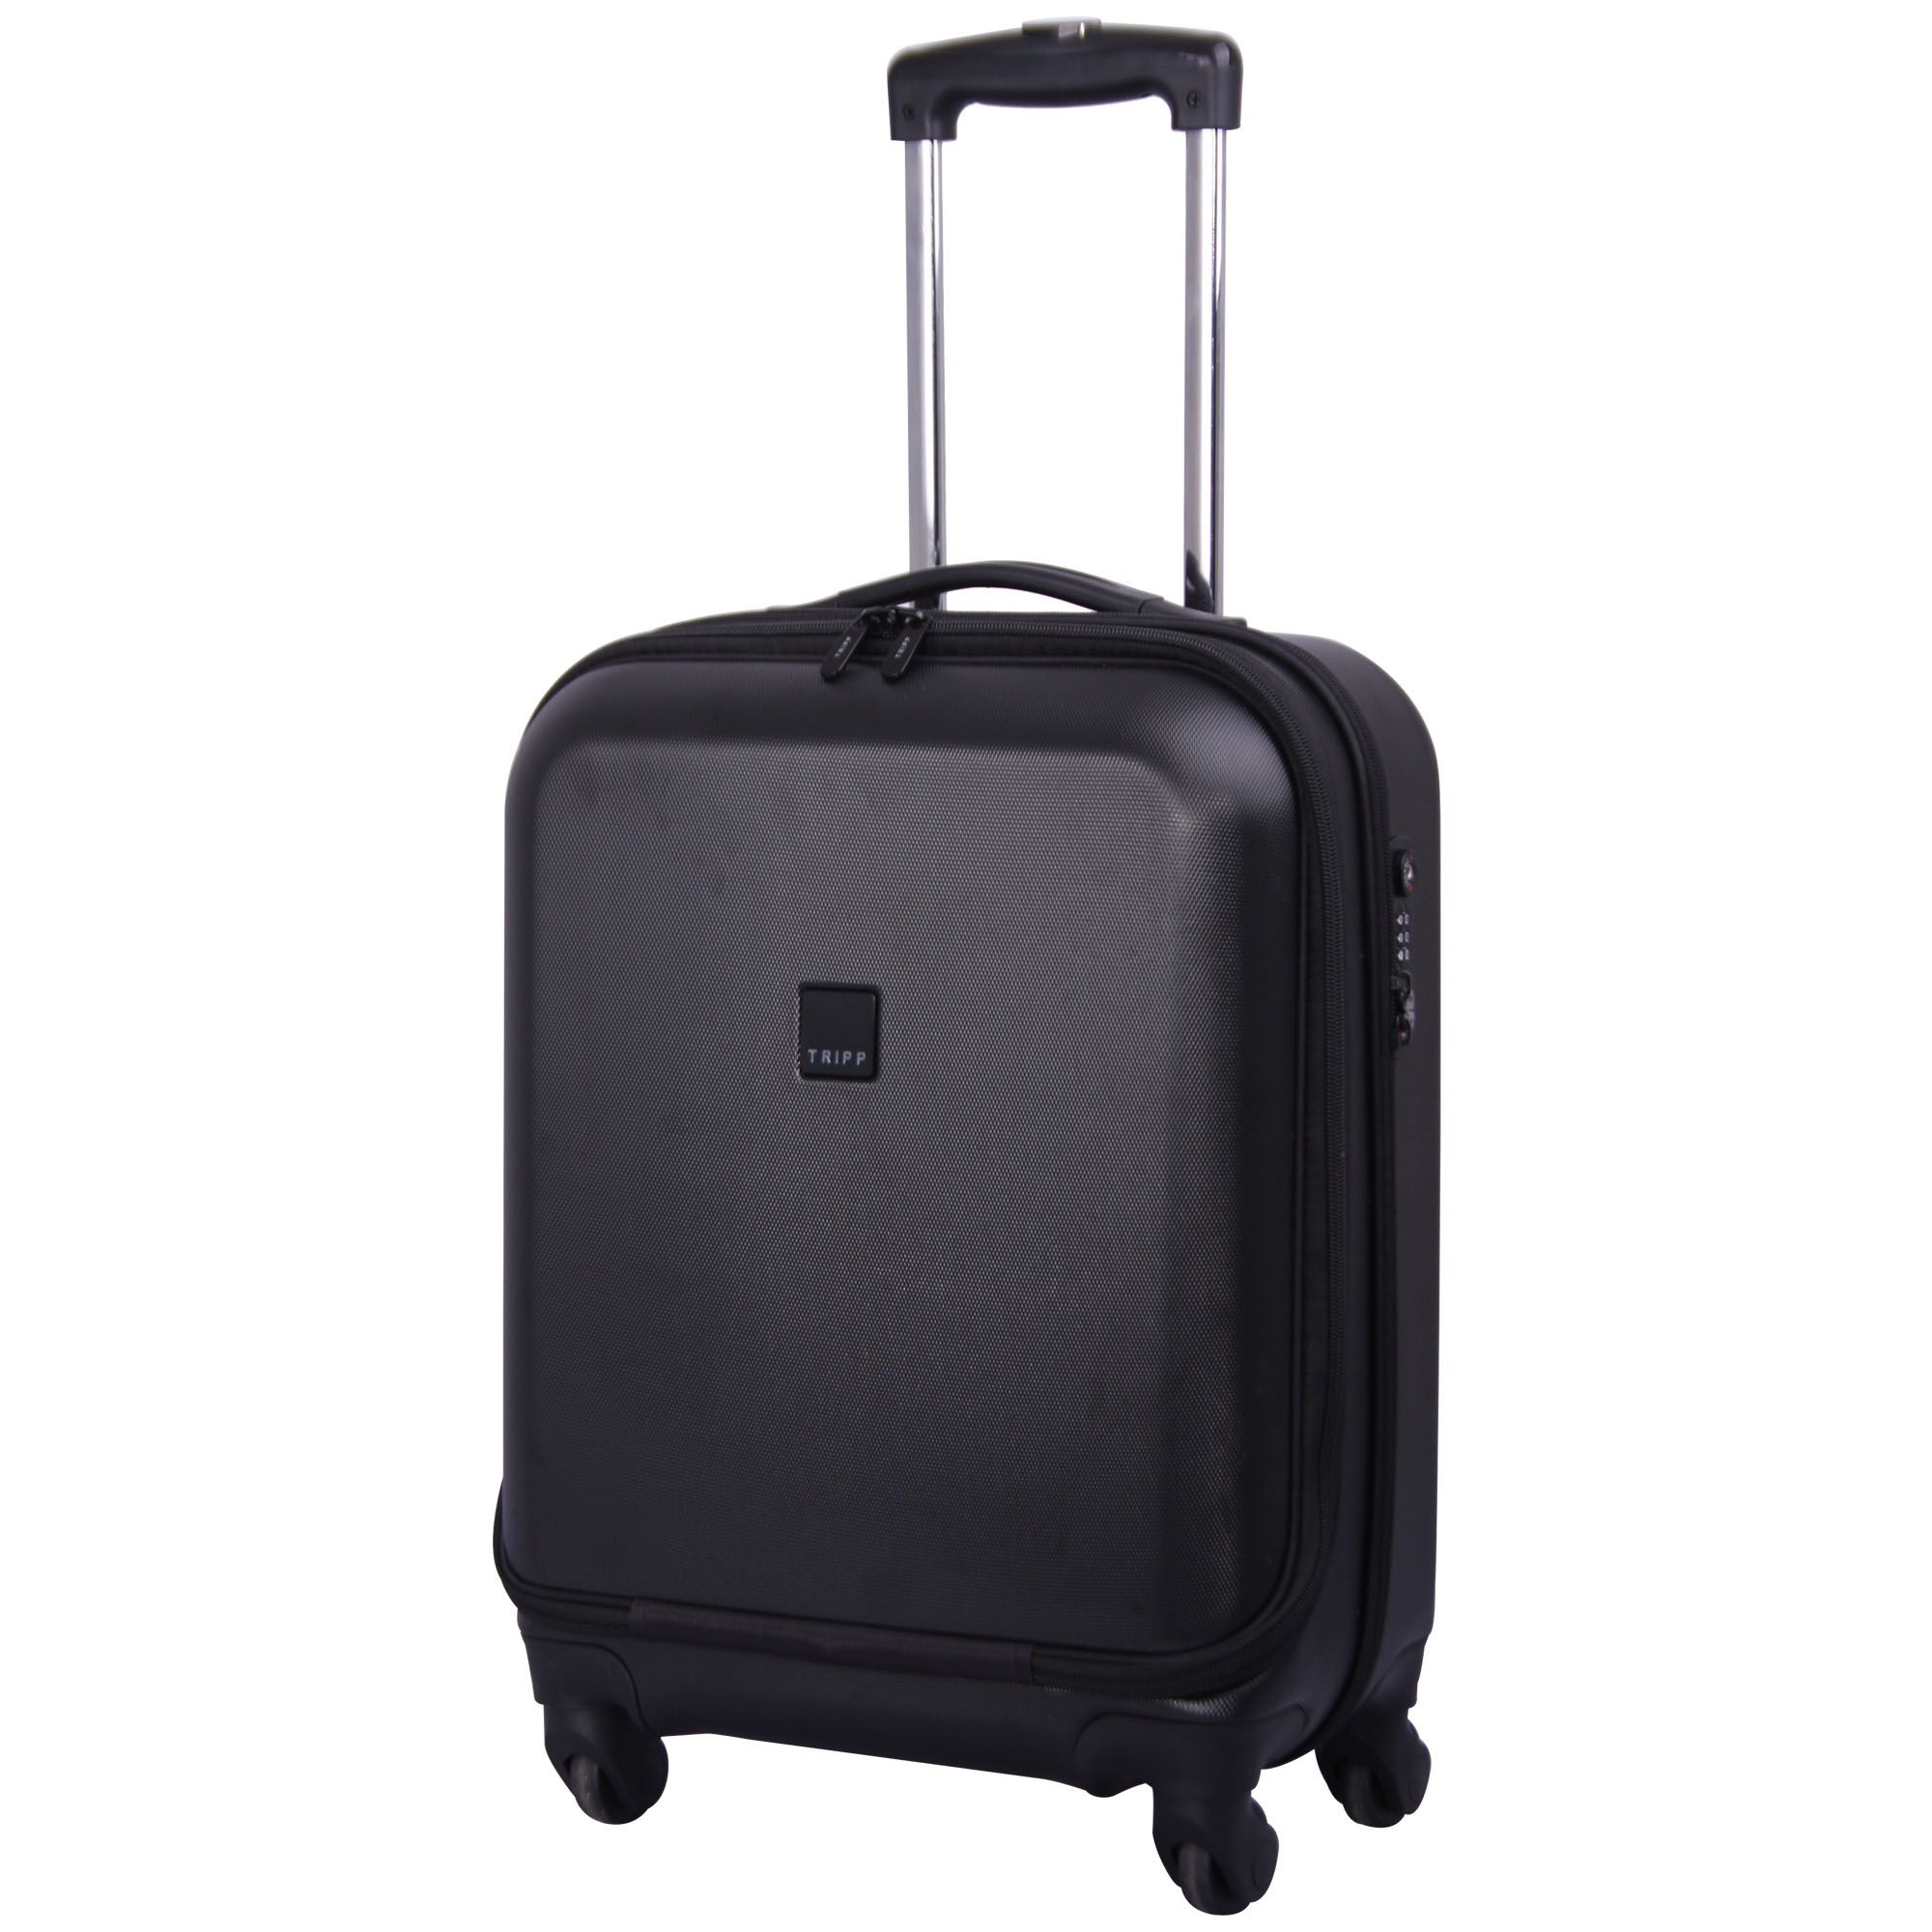 Tripp Black Lite 4 Wheel Dual Access Cabin Suitcase